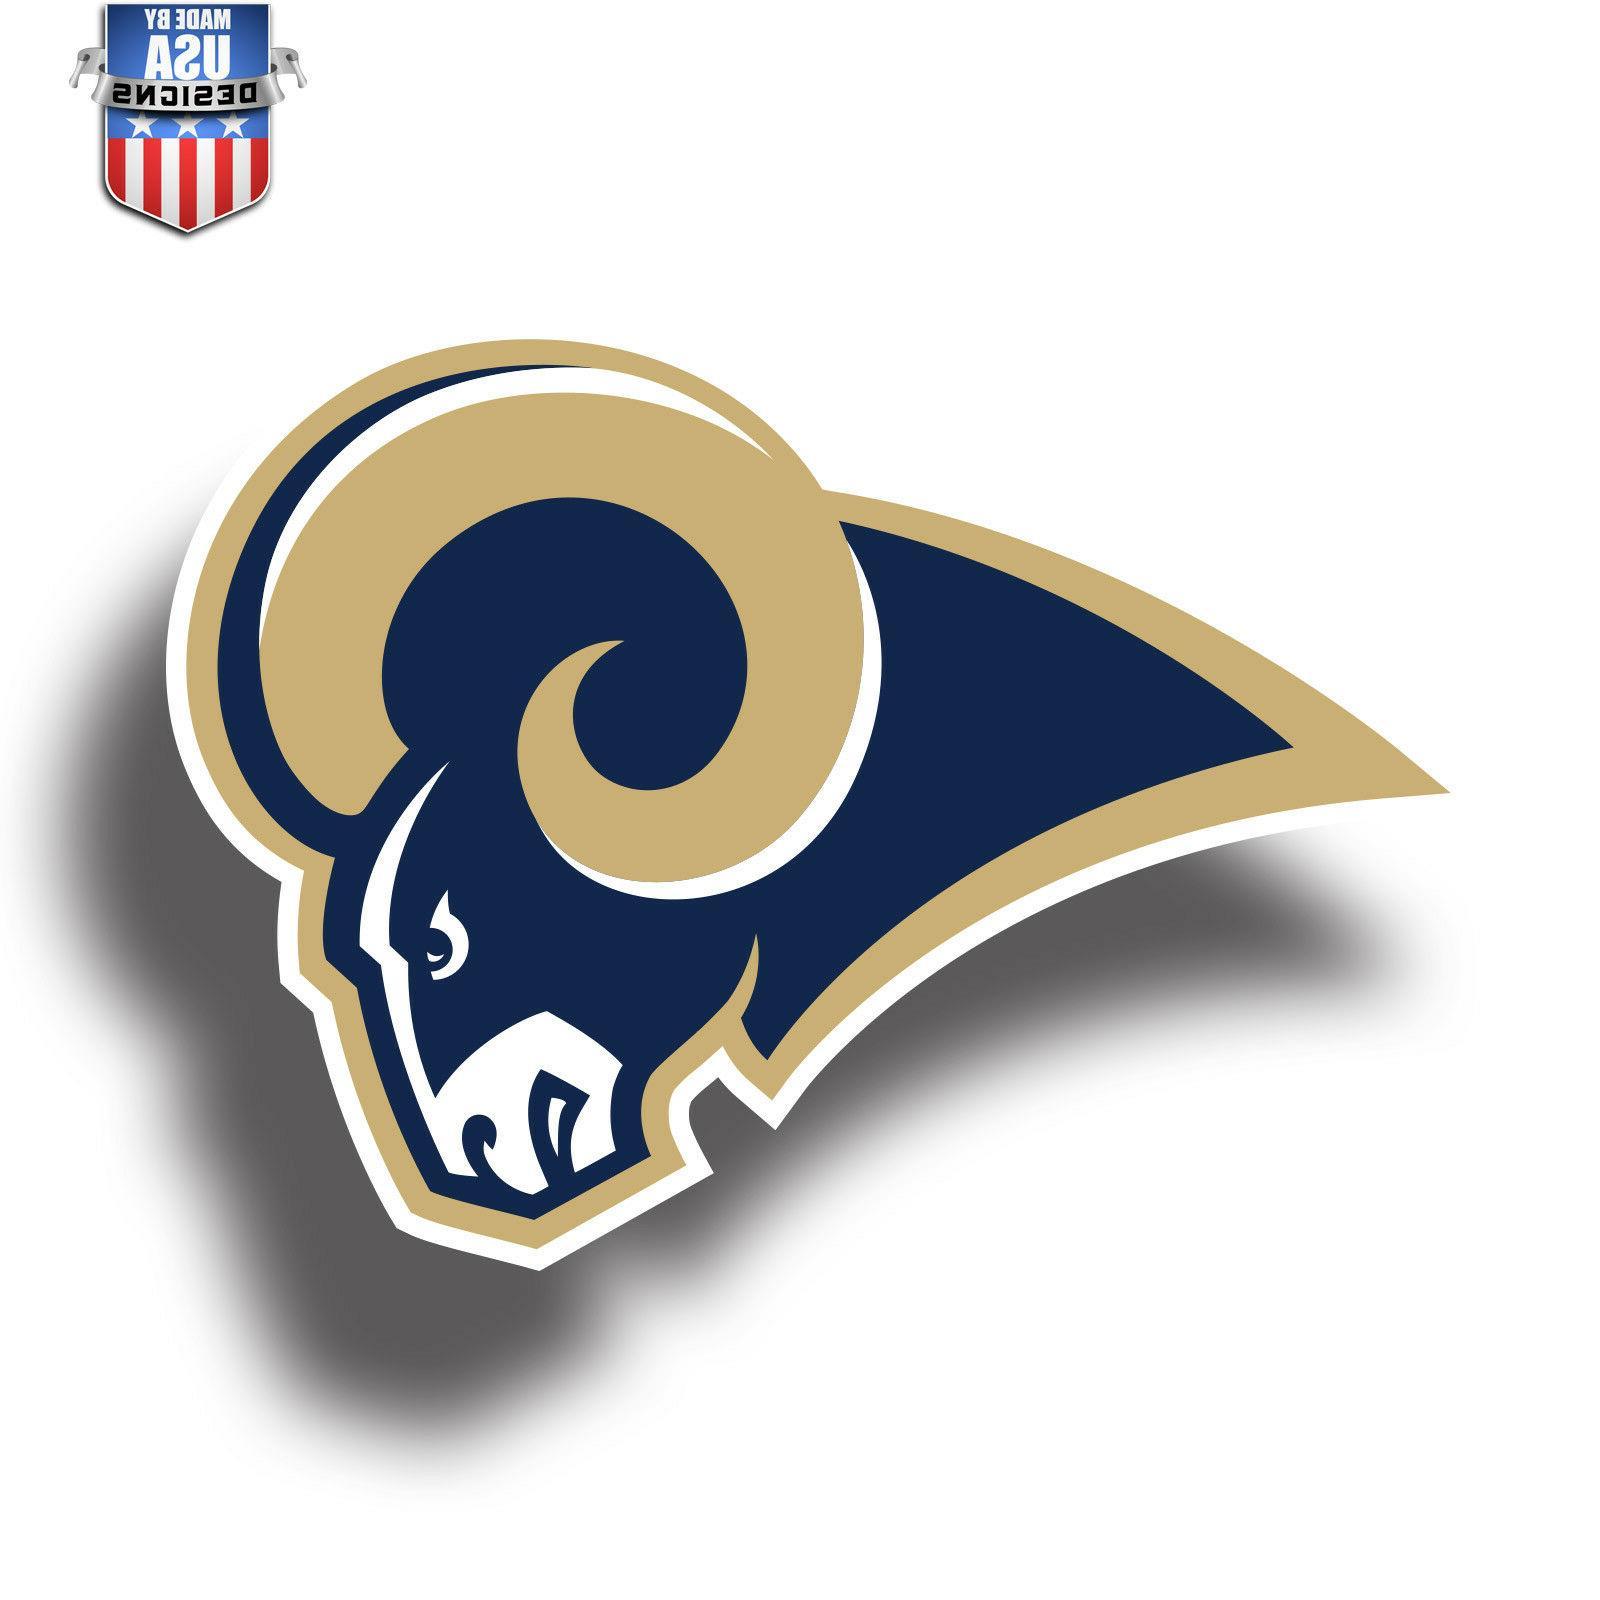 los angeles rams nfl football color logo